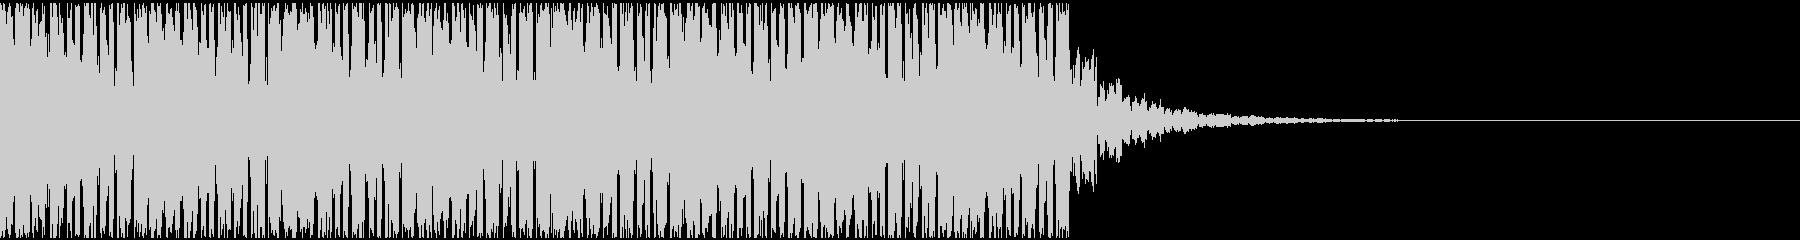 【EDM】約20秒、ジングル4の未再生の波形